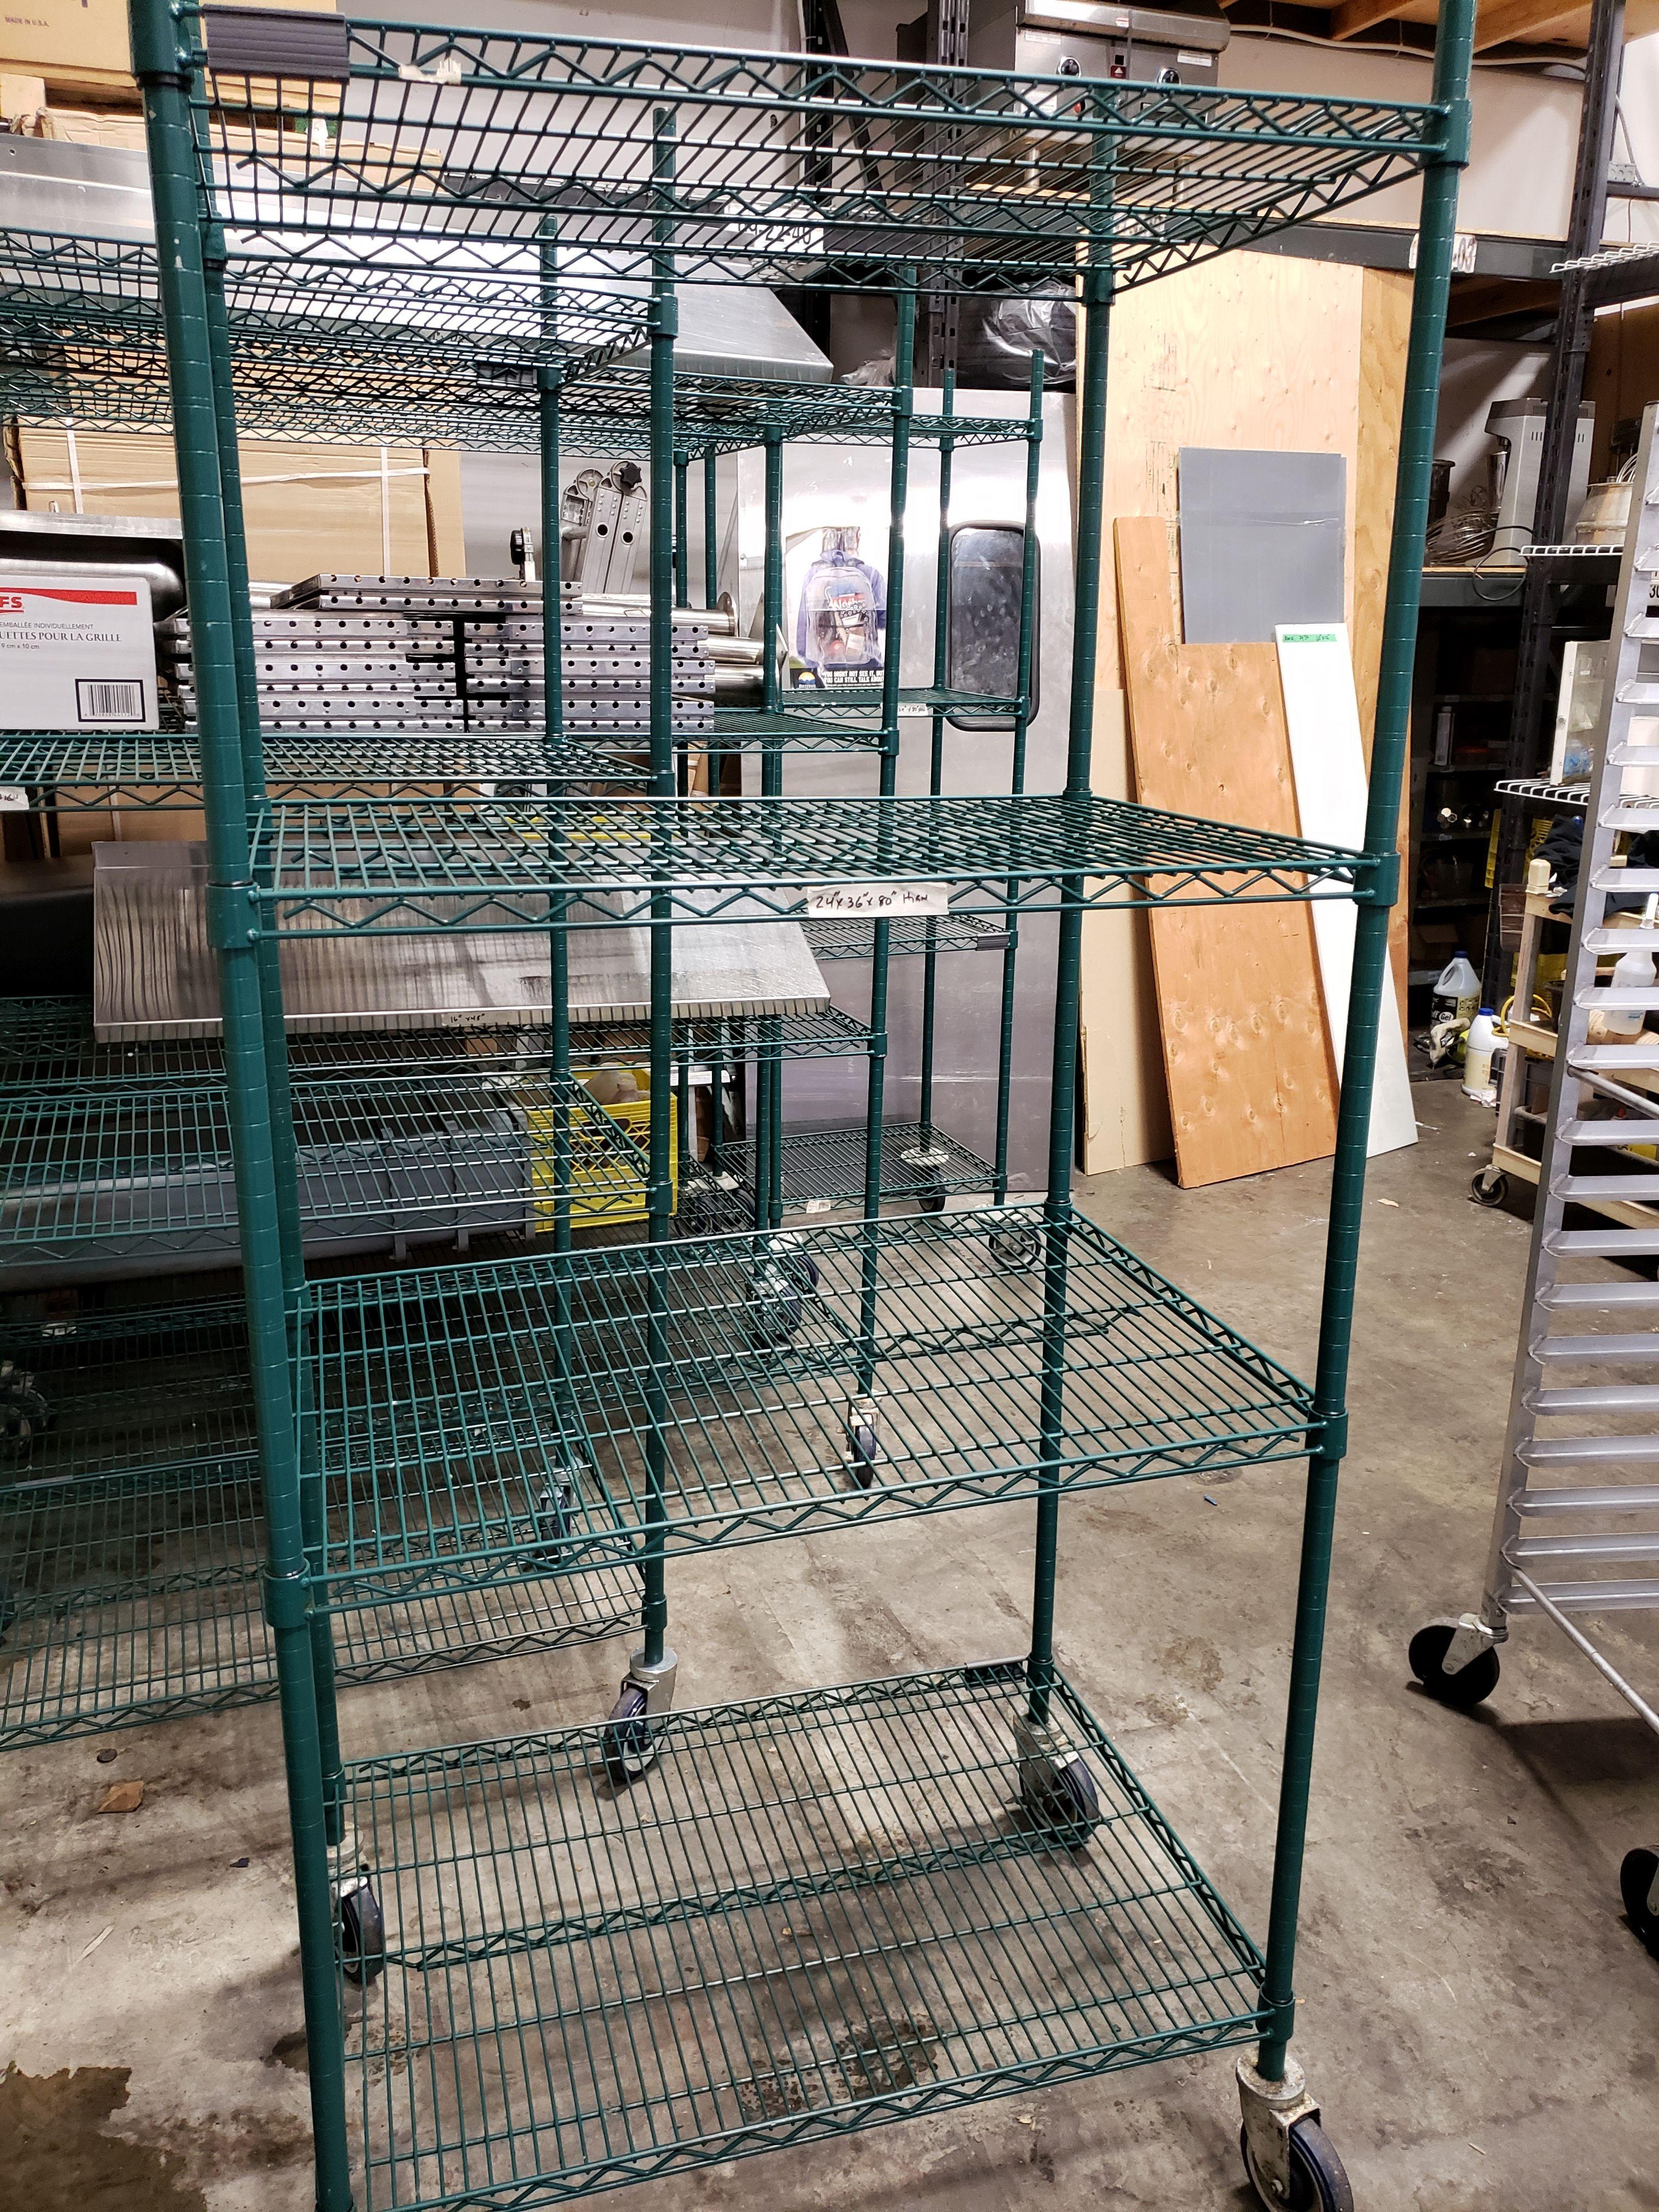 "Lot 11 - 24"" x 36"" x 80"" High Green Epoxy 4 Shelf Rack on Casters"